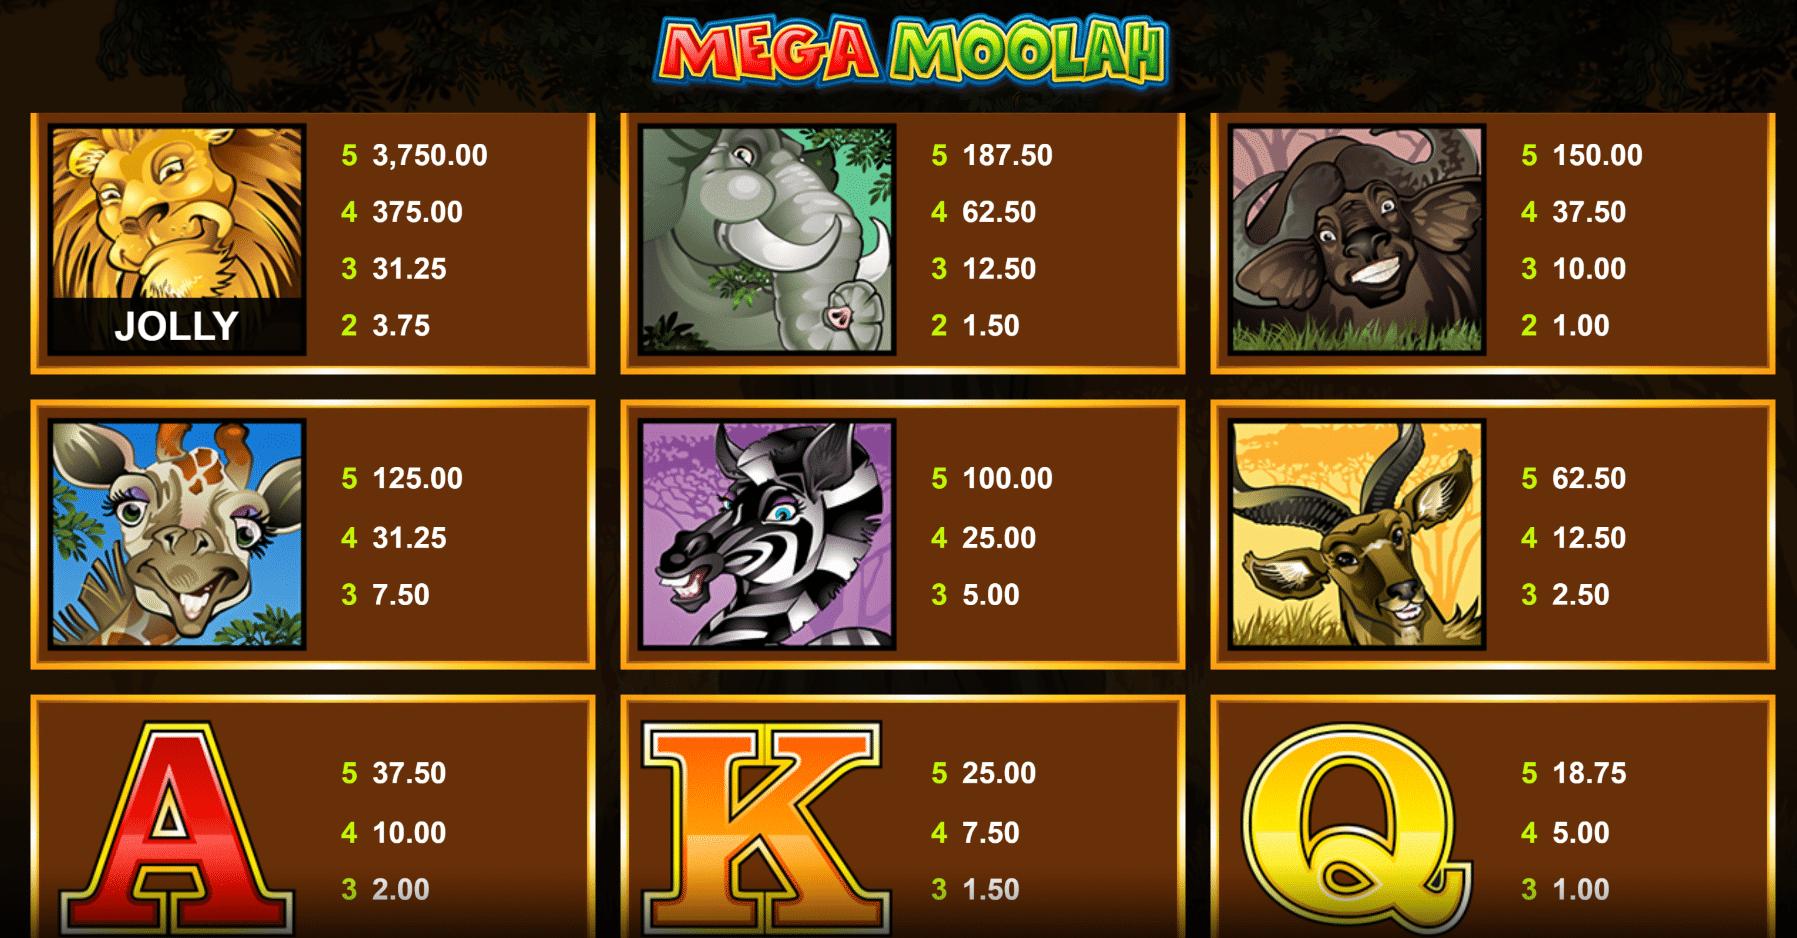 tabella delle vincite della slot mega moolah online